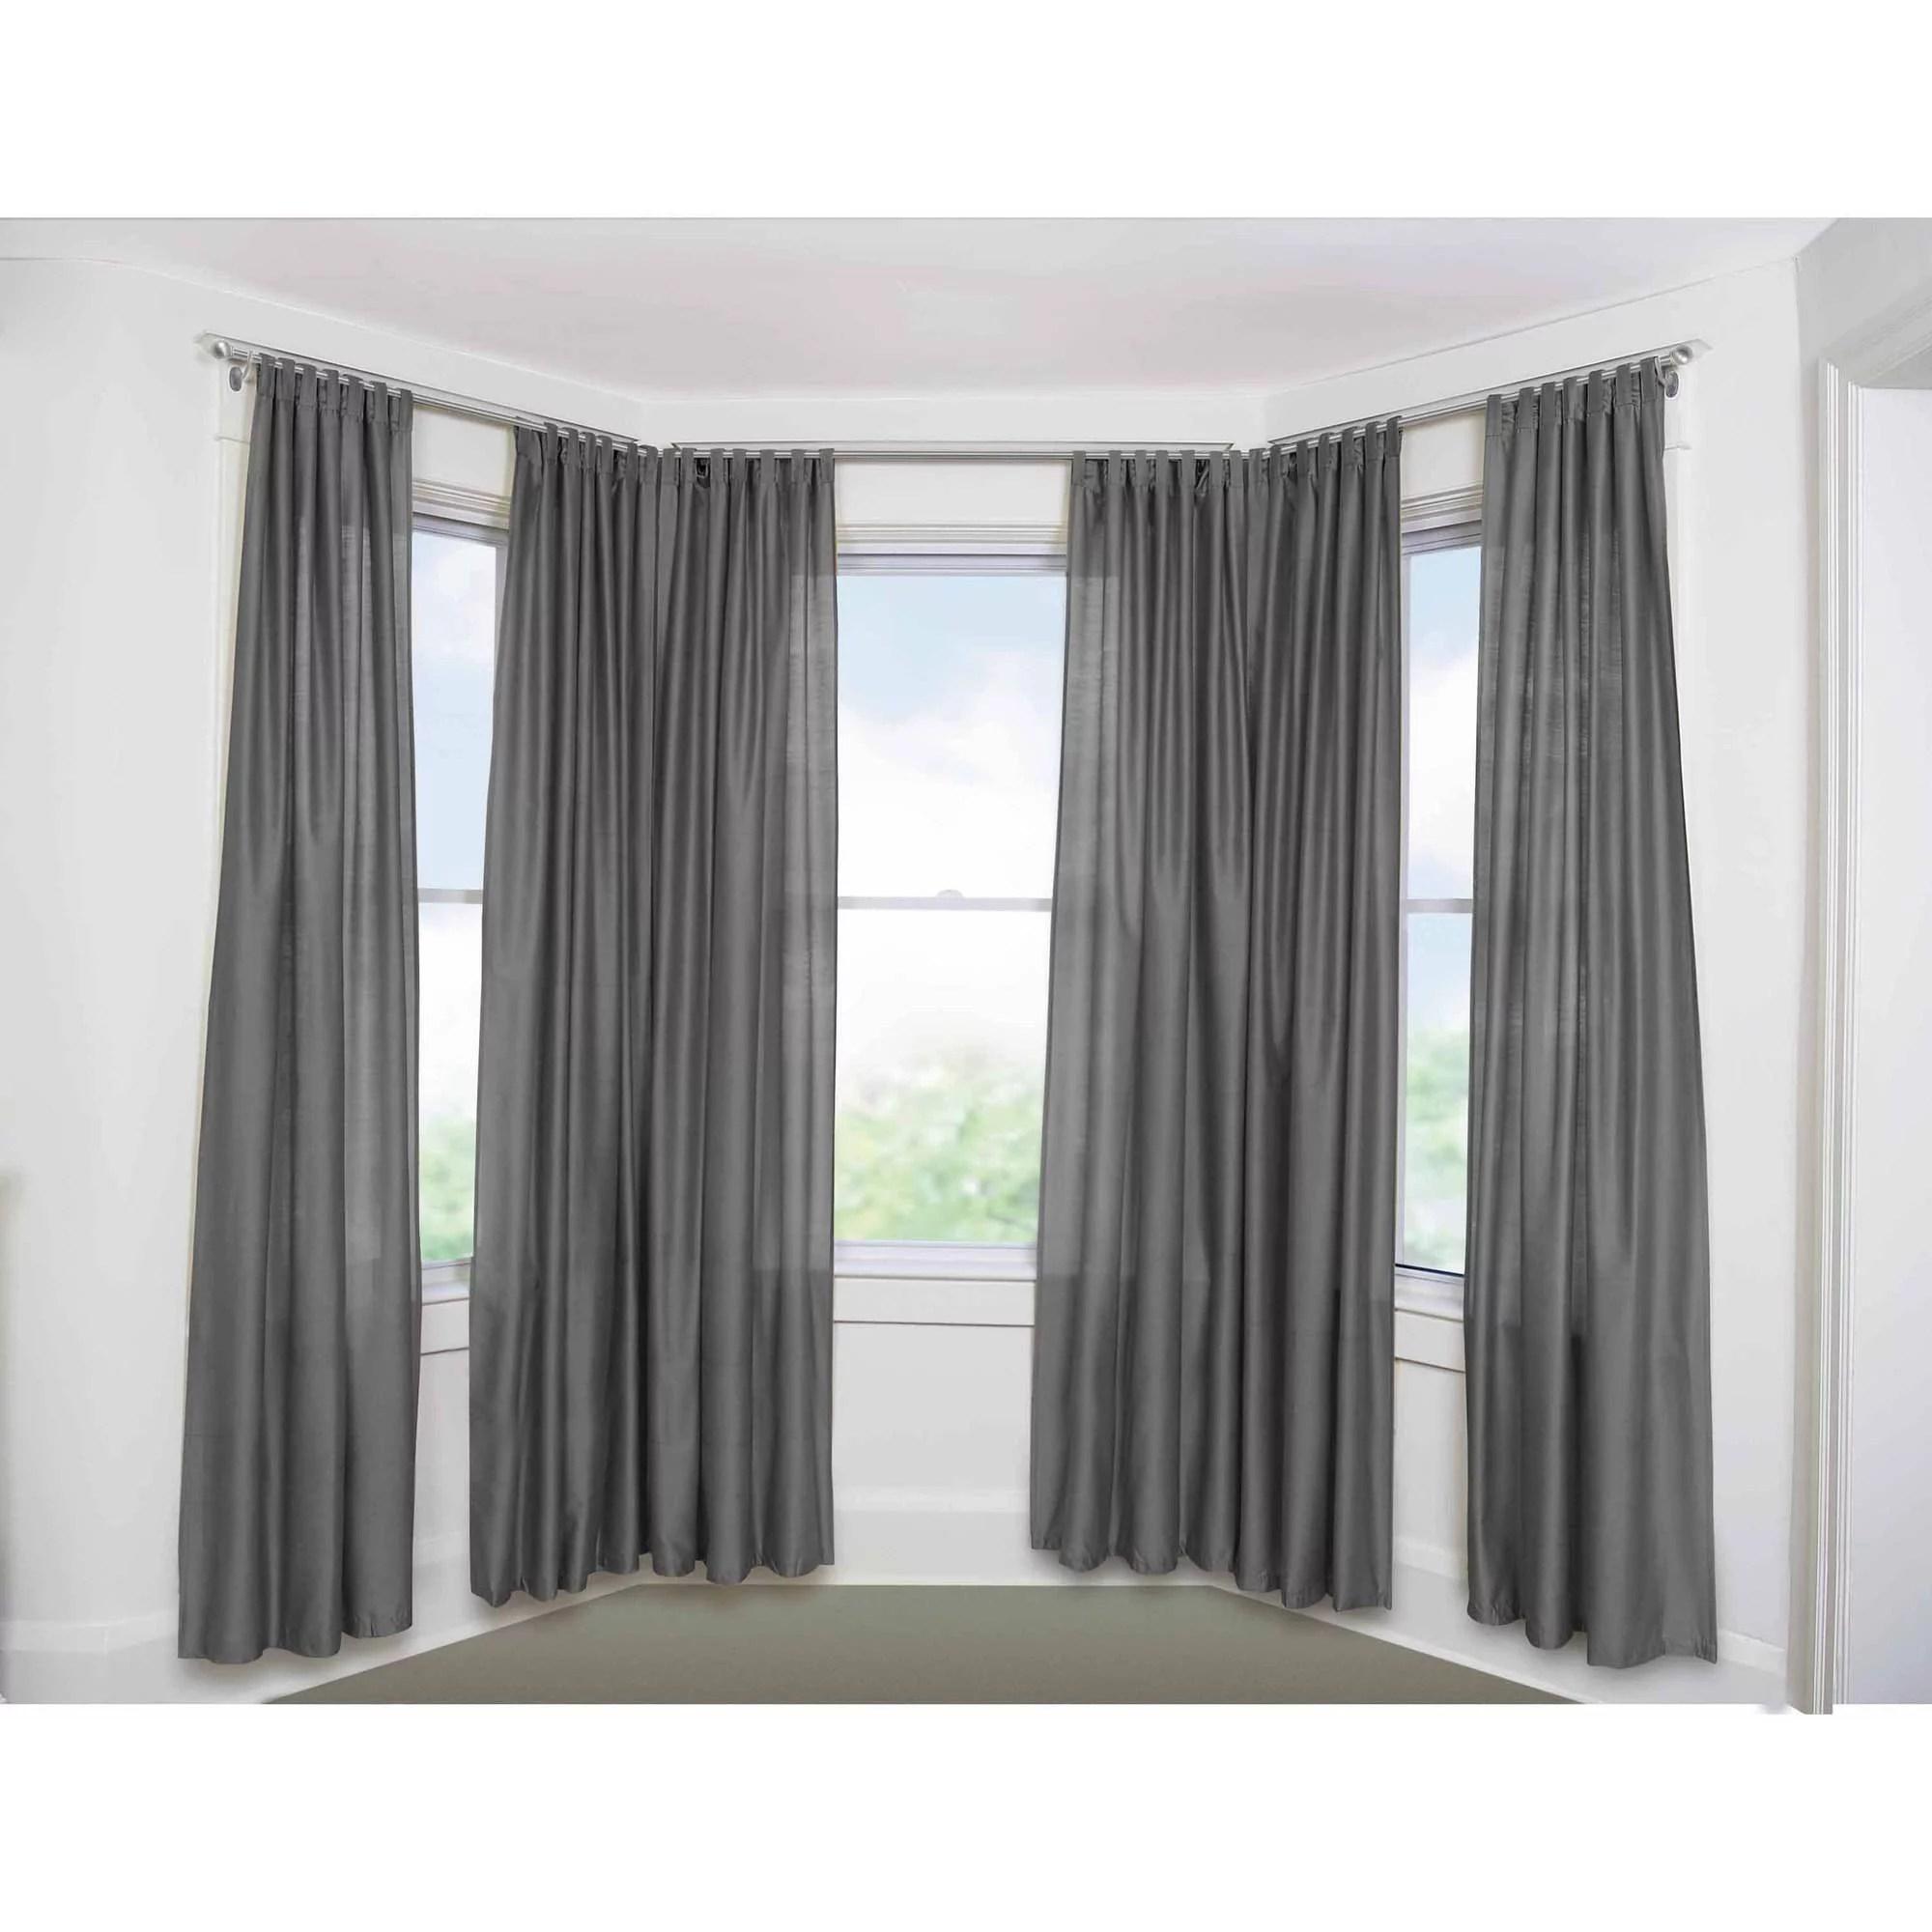 bay window adjustable curtain rod for windows 5 8 diameter